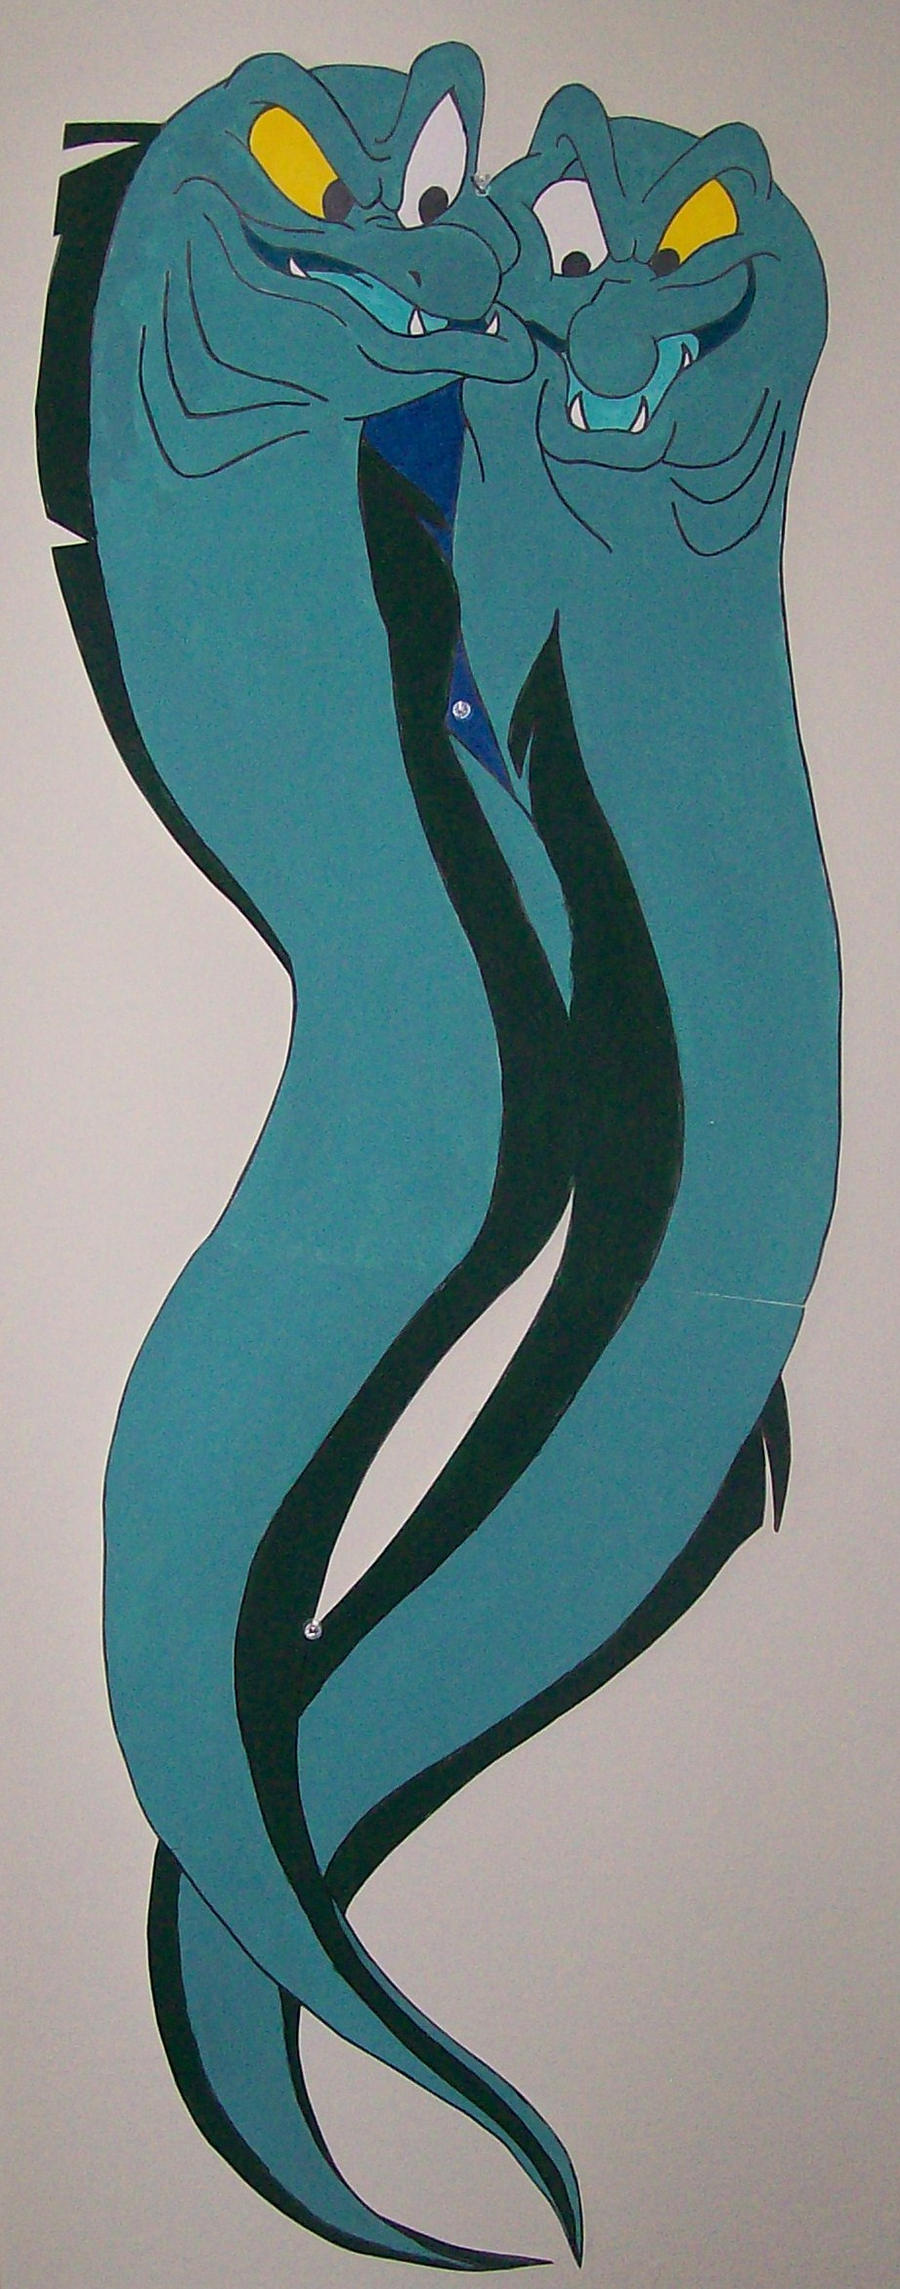 Flotsam and Jetsam Wall Decor by Jarod-the-Stampede